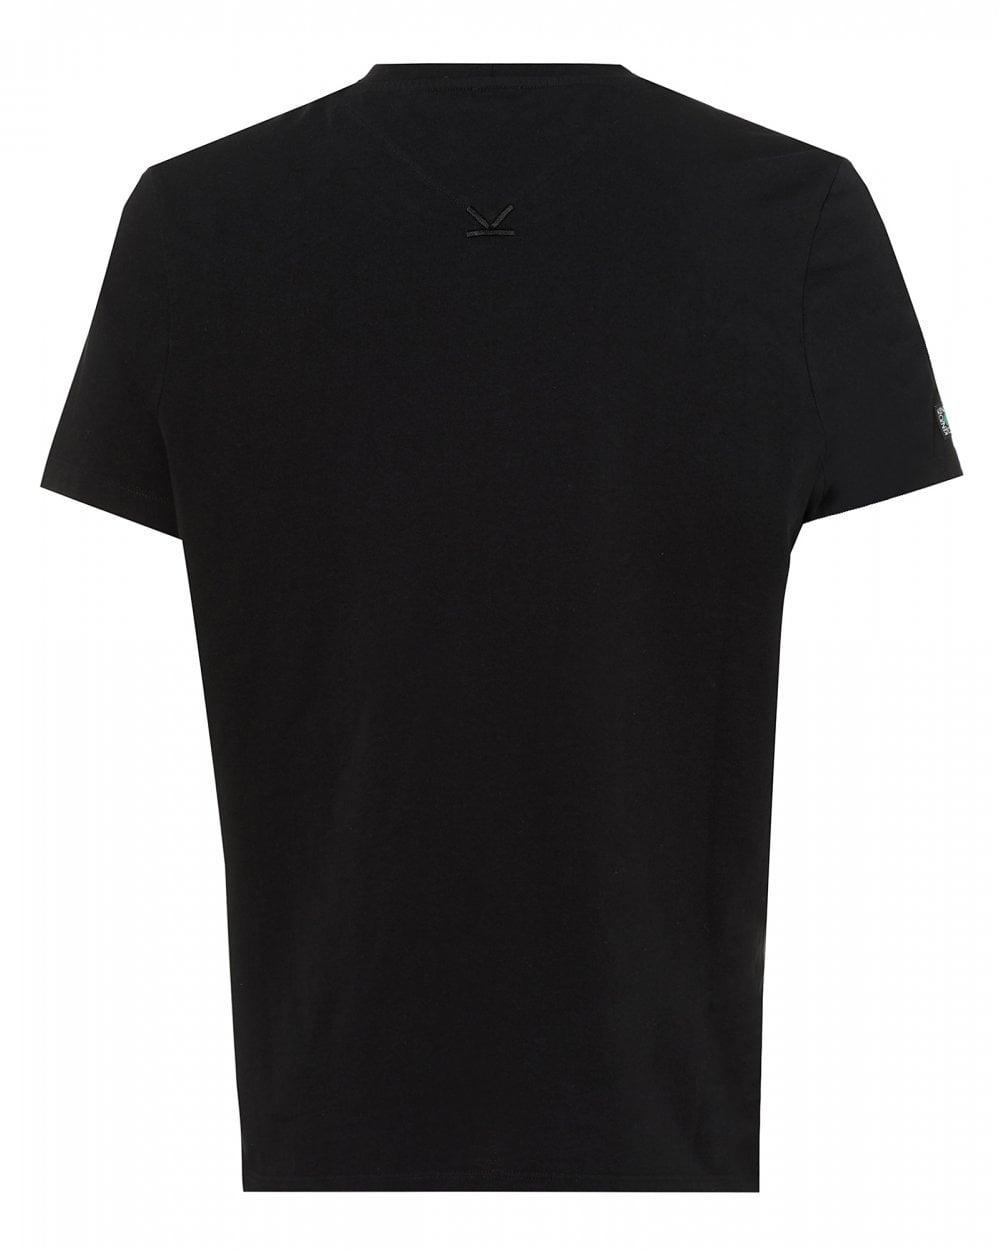 d2a5eb22d KENZO Logo Print T-shirt in Black for Men - Save 5% - Lyst